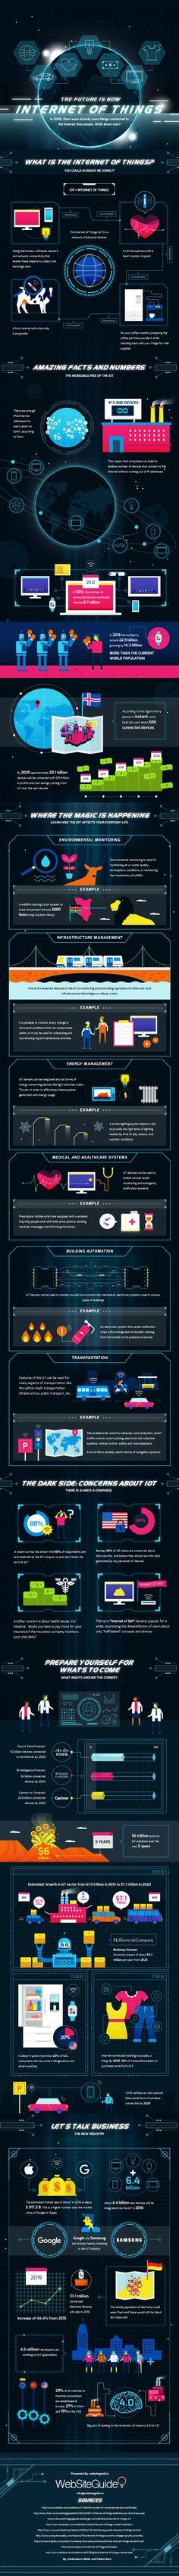 The future is now - Internet of Things   De waanzinnige groei van IoT